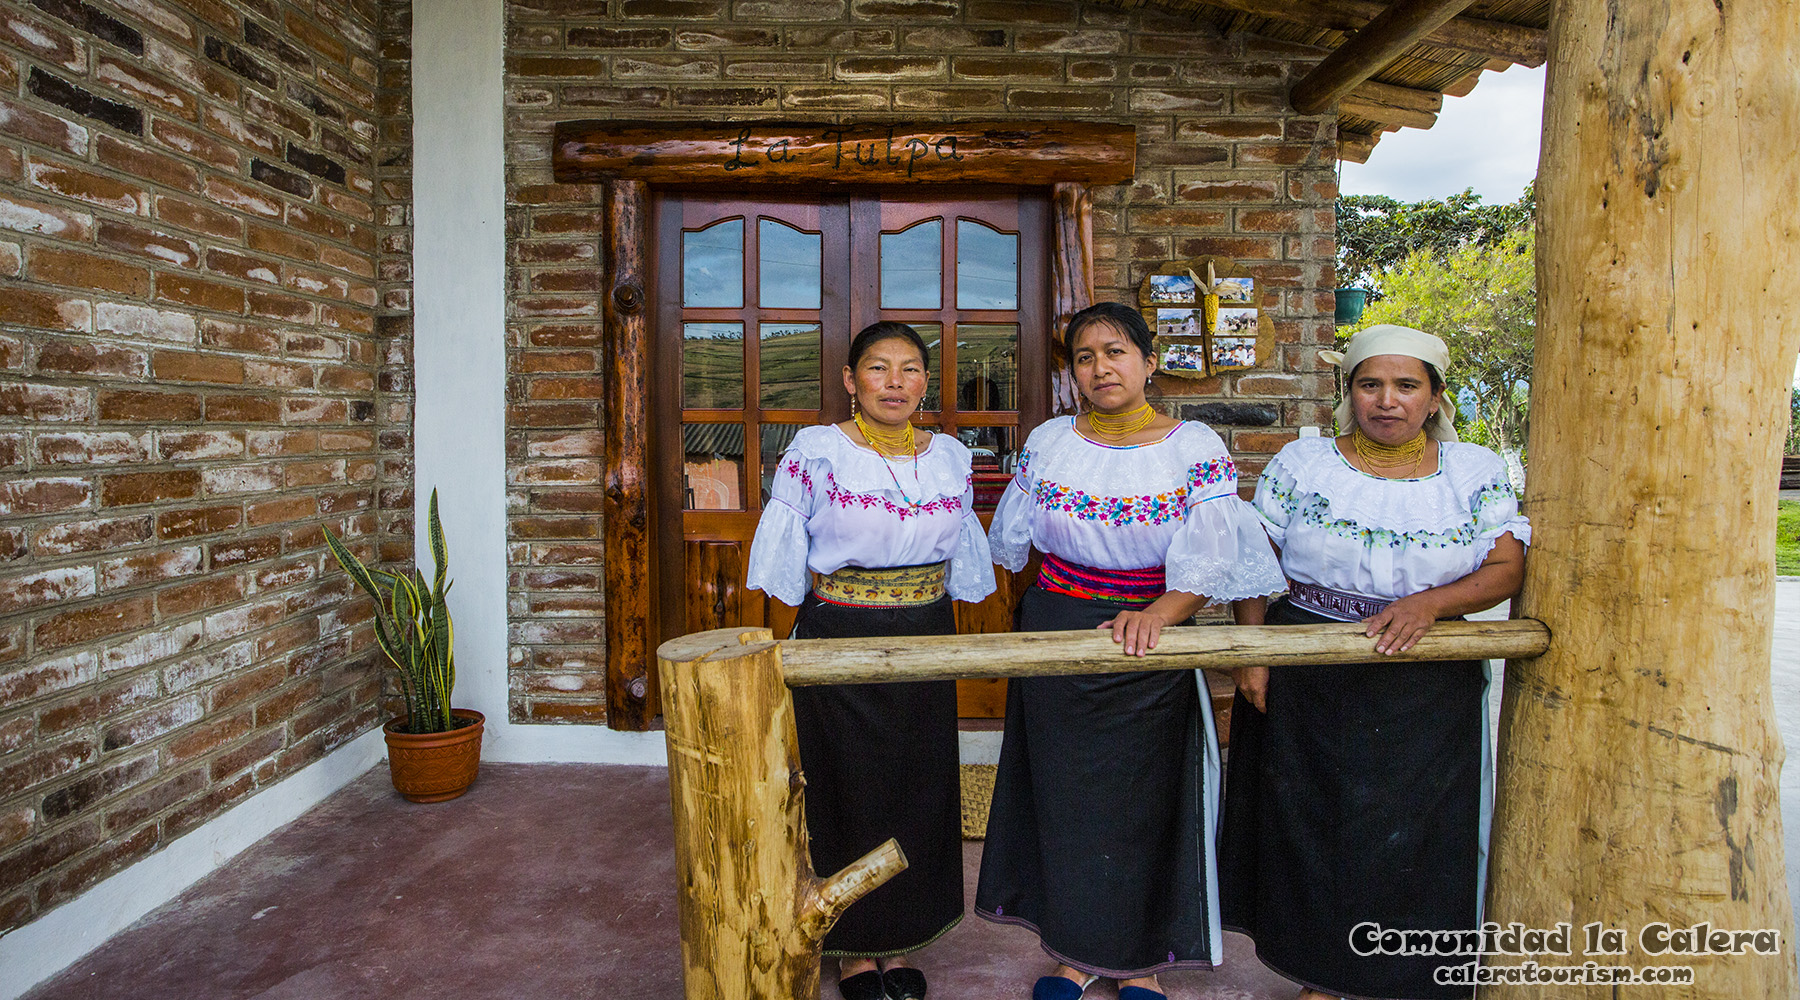 comedor tradicional la tulpa cotacachi